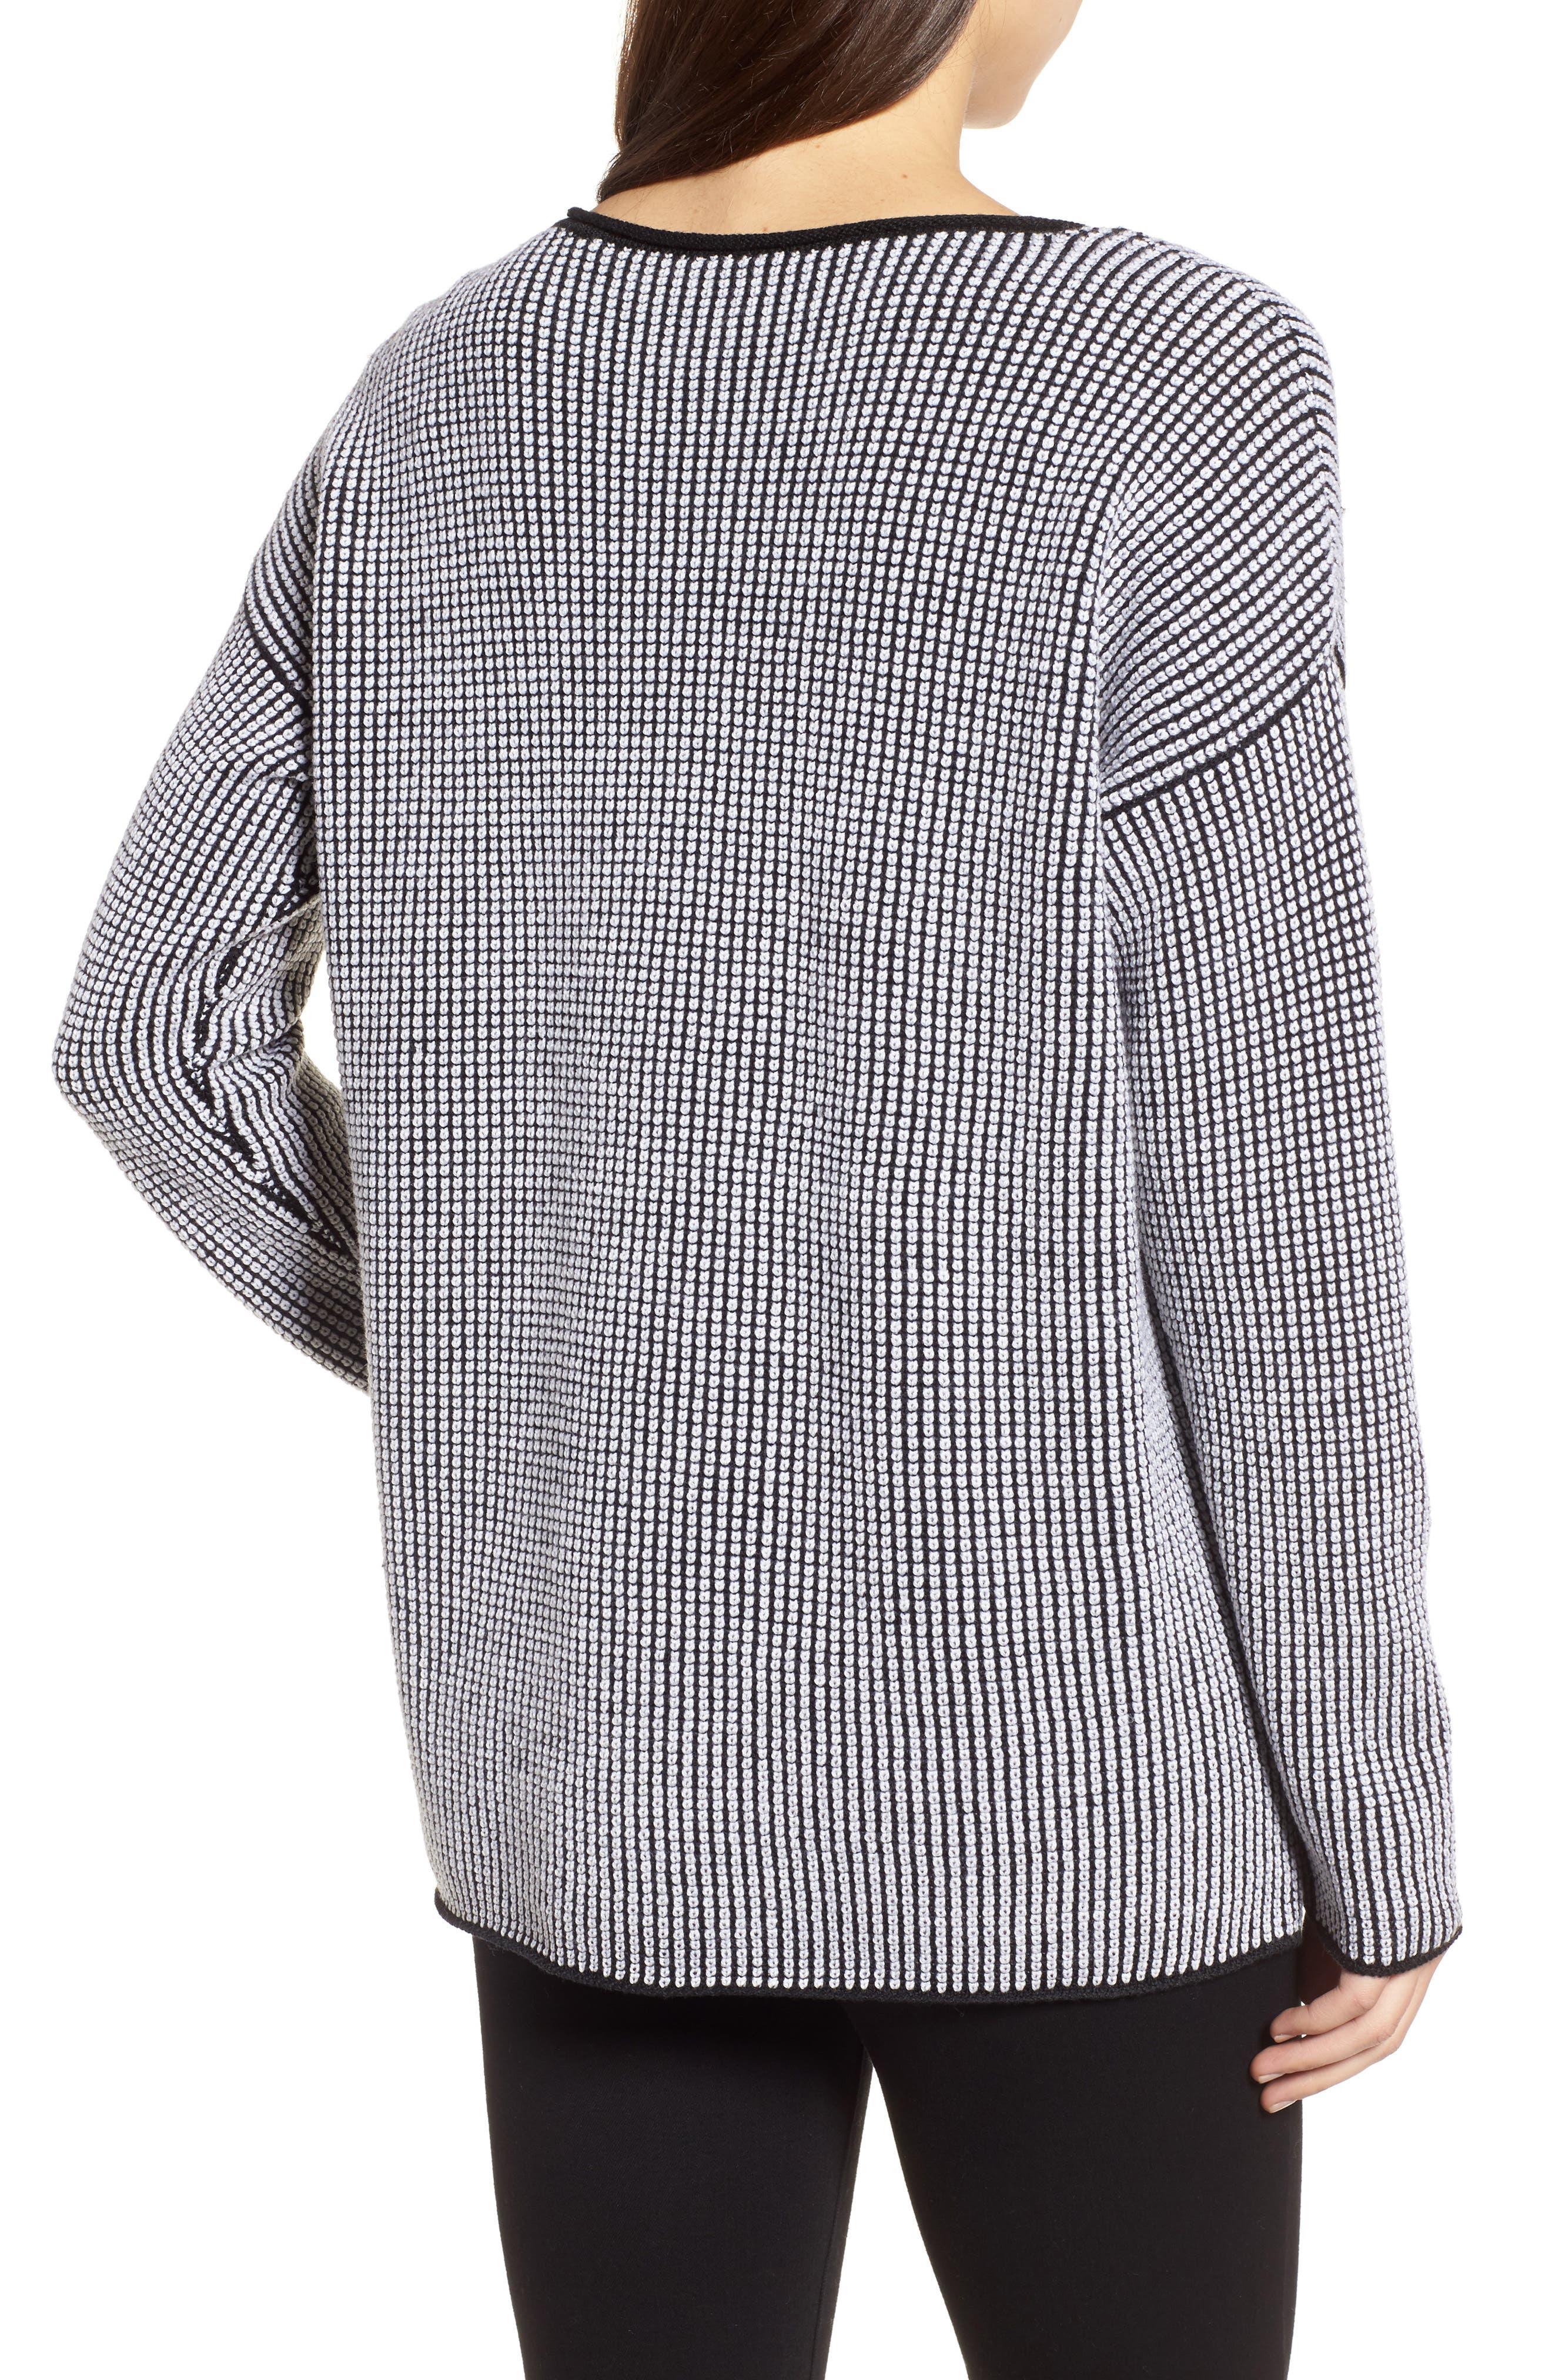 Textured Merino Wool Sweater,                             Alternate thumbnail 2, color,                             112